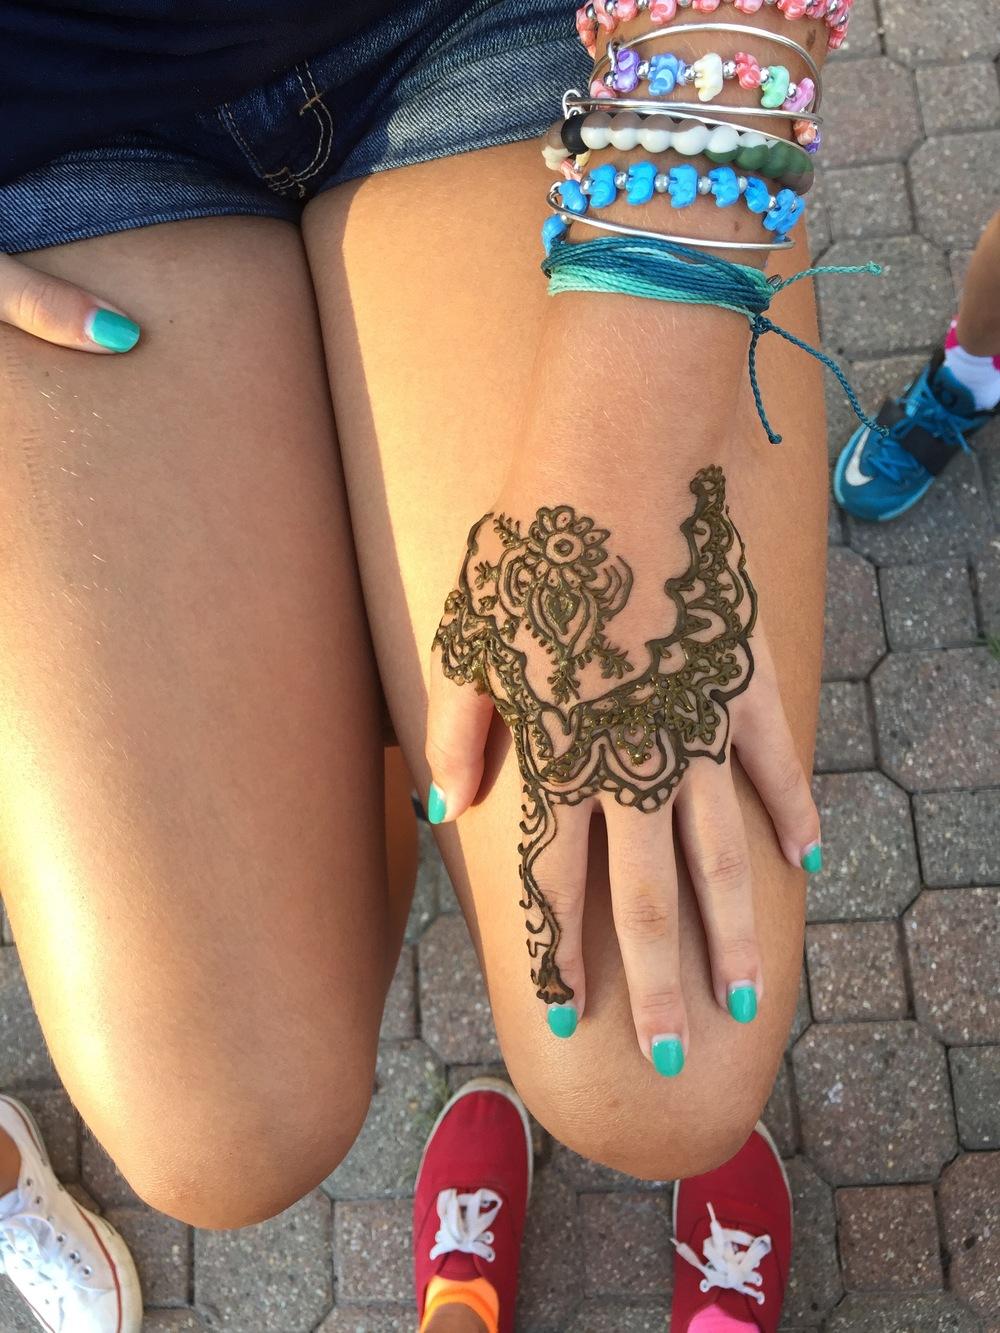 Gallery - Henna AMAZING hand design.jpg